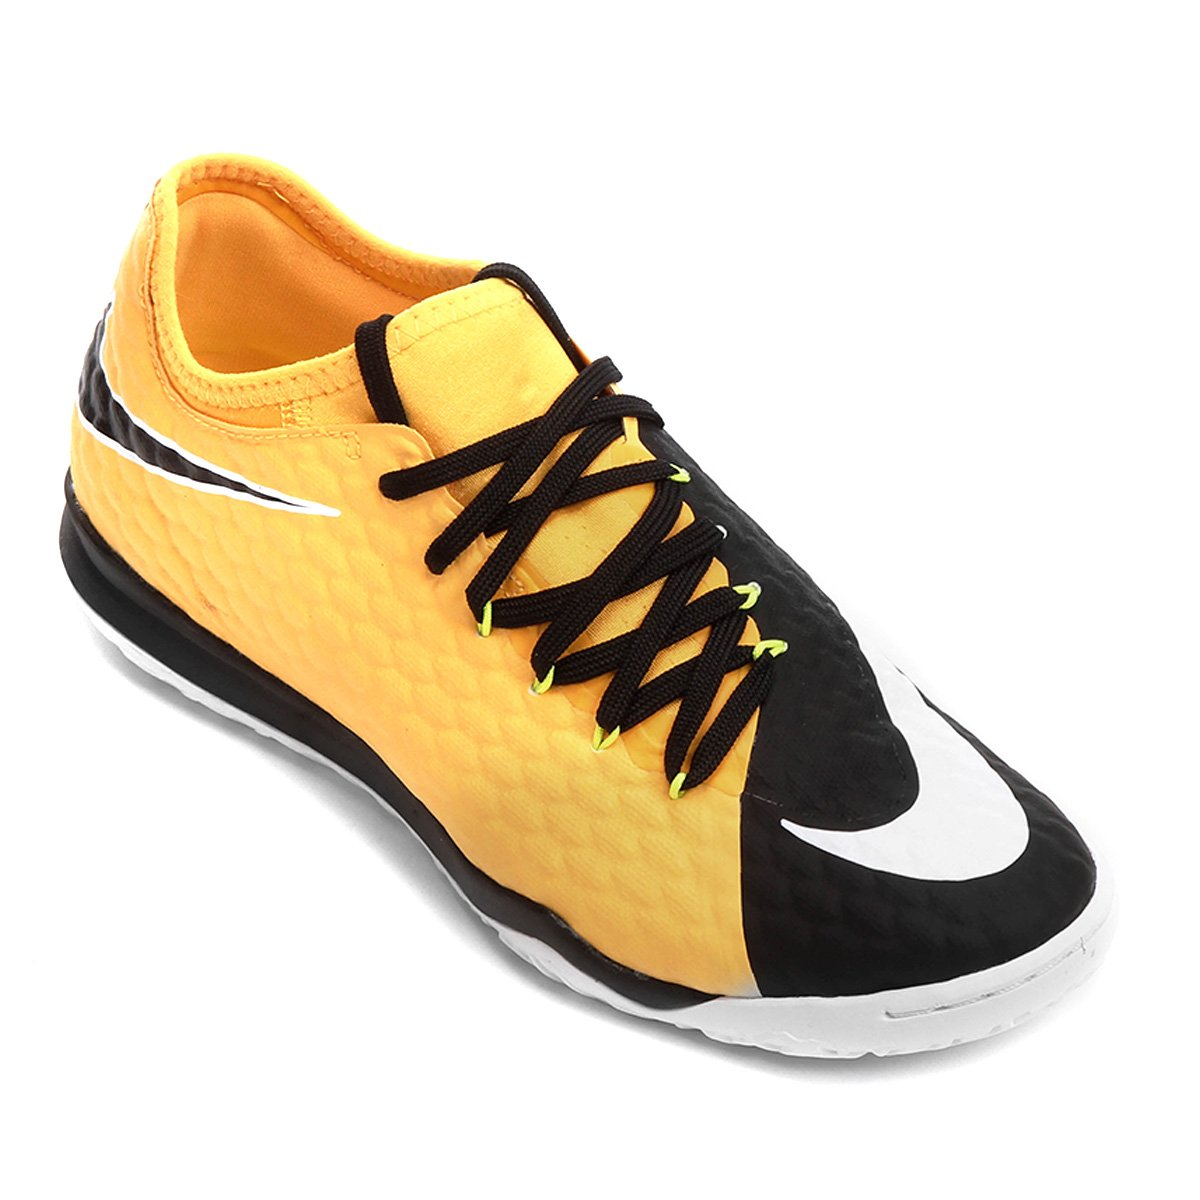 Chuteira Futsal Nike Hypervenom Finale 2 IC - Laranja e Preto ... a852357f007d2